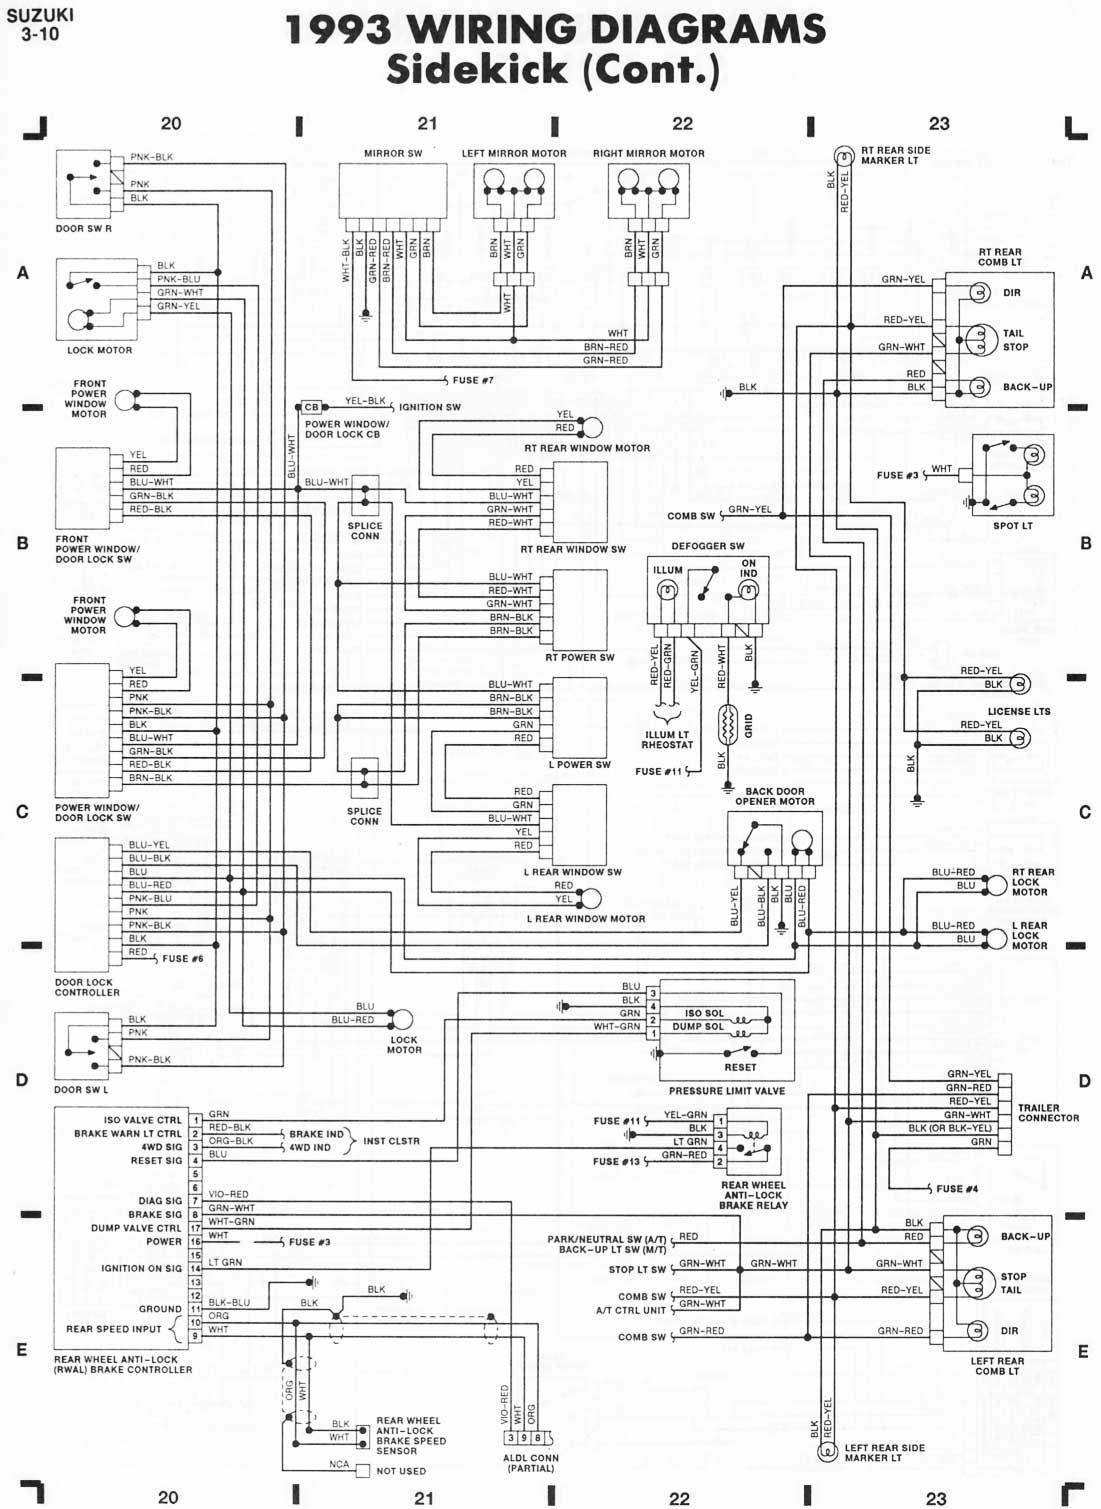 C C further Maxresdefault additionally Vn in addition Volvo Wiring Diagram New Volvo Wiring Diagram Tps Volvo Wiring Diagrams Instructions Of Volvo Wiring Diagram together with Famous Suzuki Sidekick Wiring Diagram Contemporary Of Suzuki Sidekick Wiring Diagram. on 1990 suzuki sidekick wiring diagram